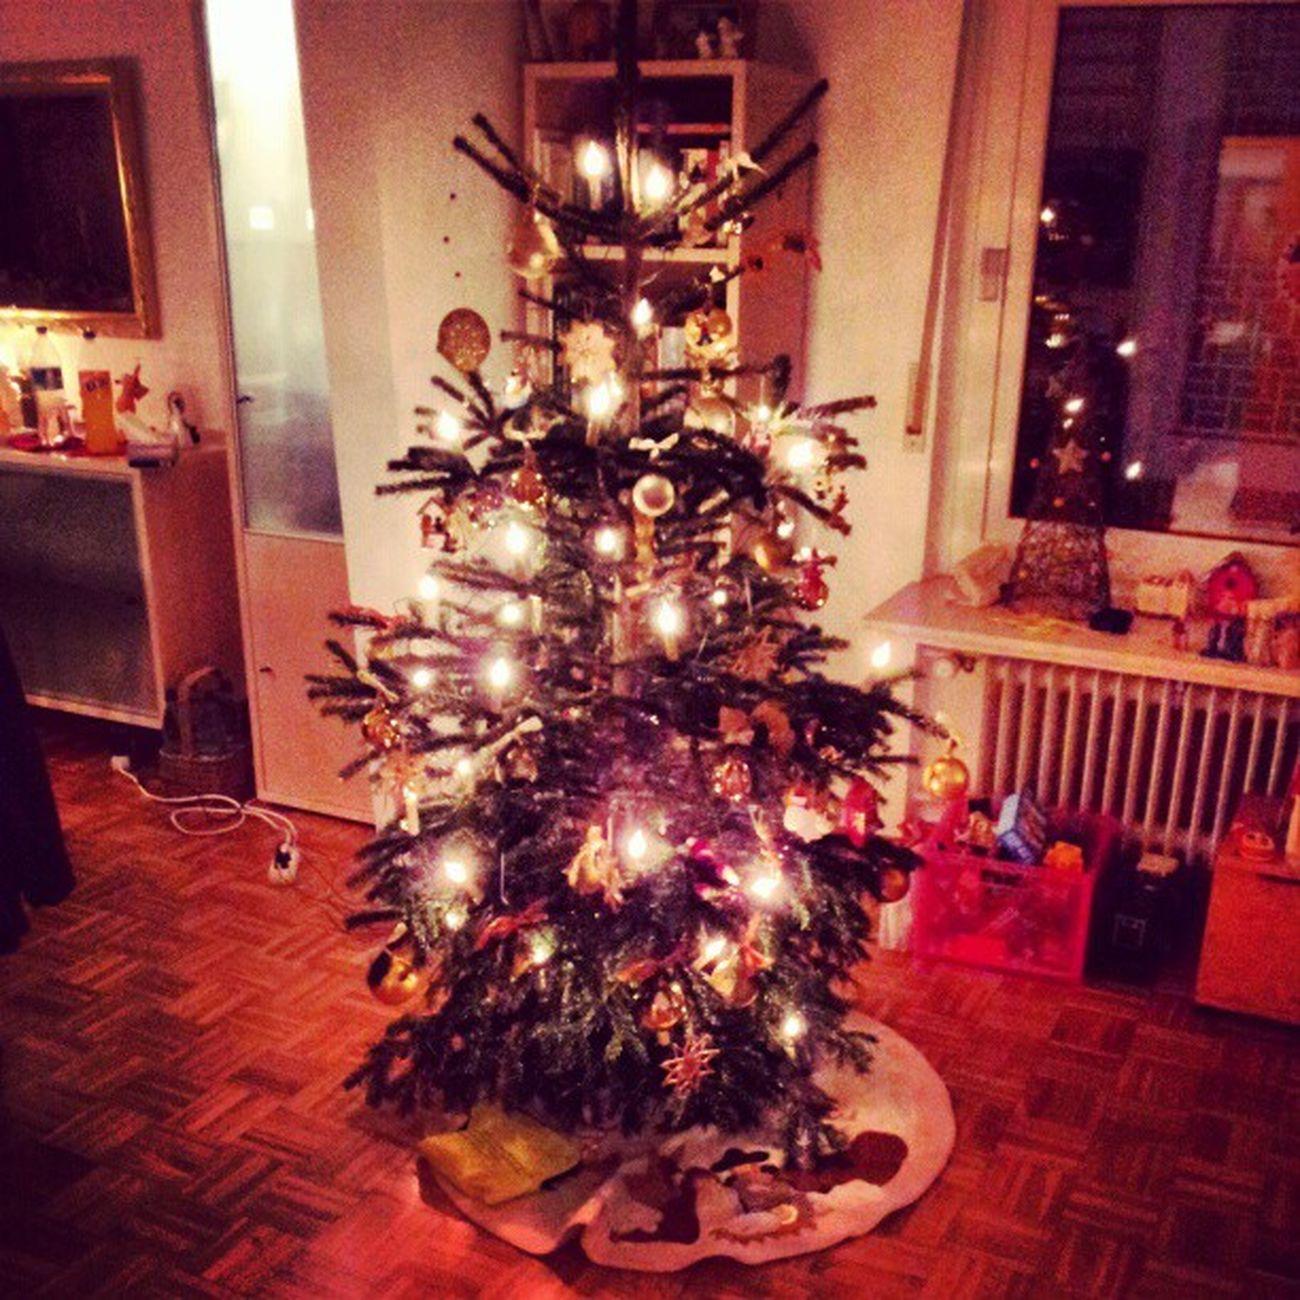 #chrismas #tree #igers #instagramm #igfamos #instagood Tree Chrismas Igers Instagramm Instagood Igfamos